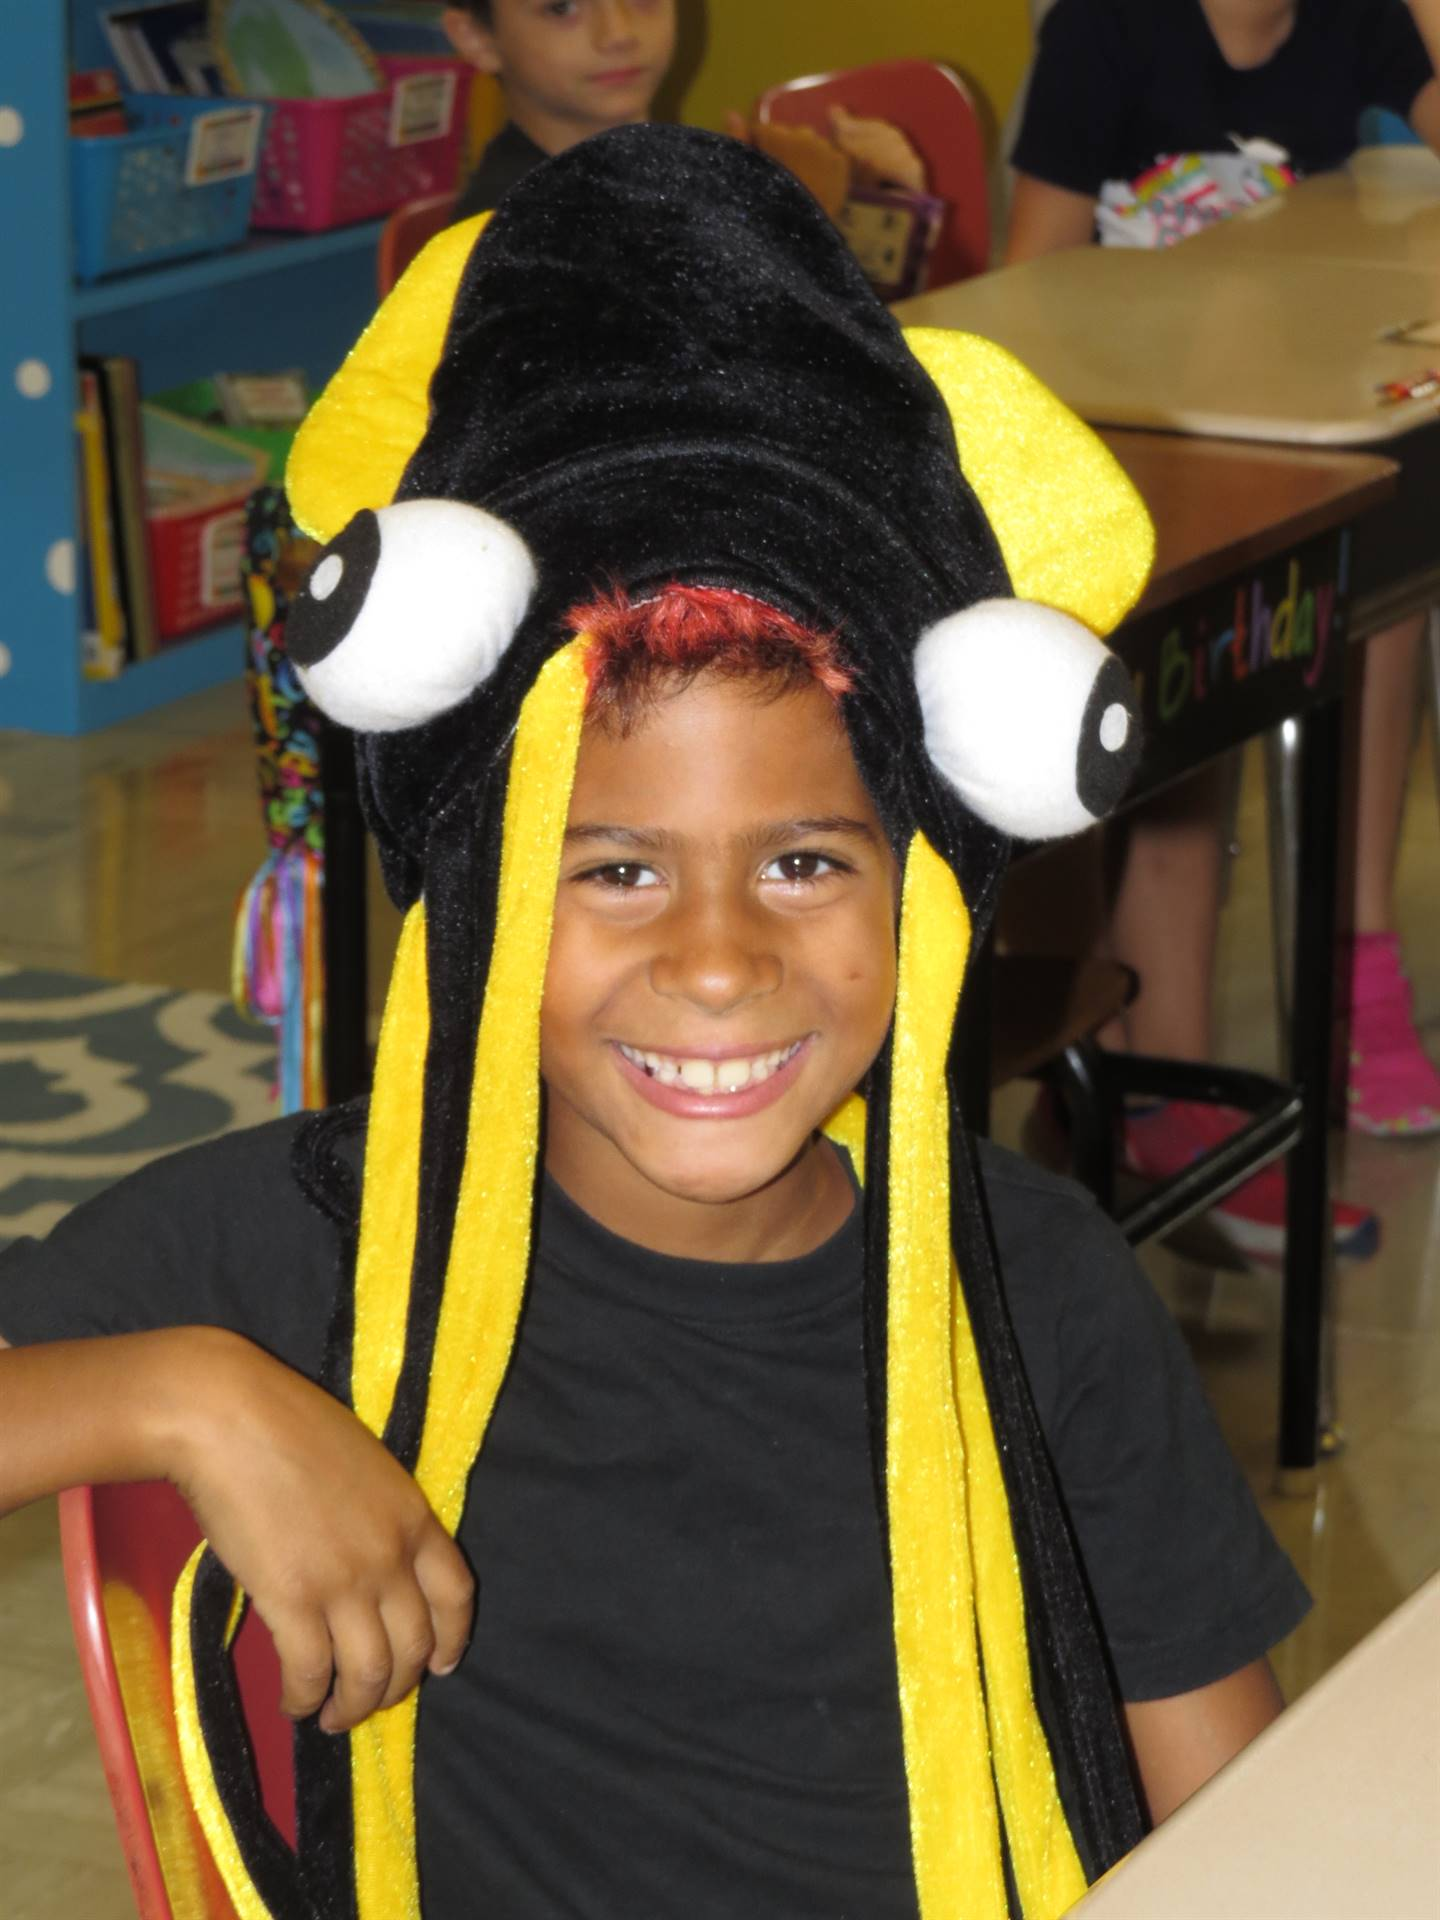 Crazy-Hat/Crazy-Hair-Day